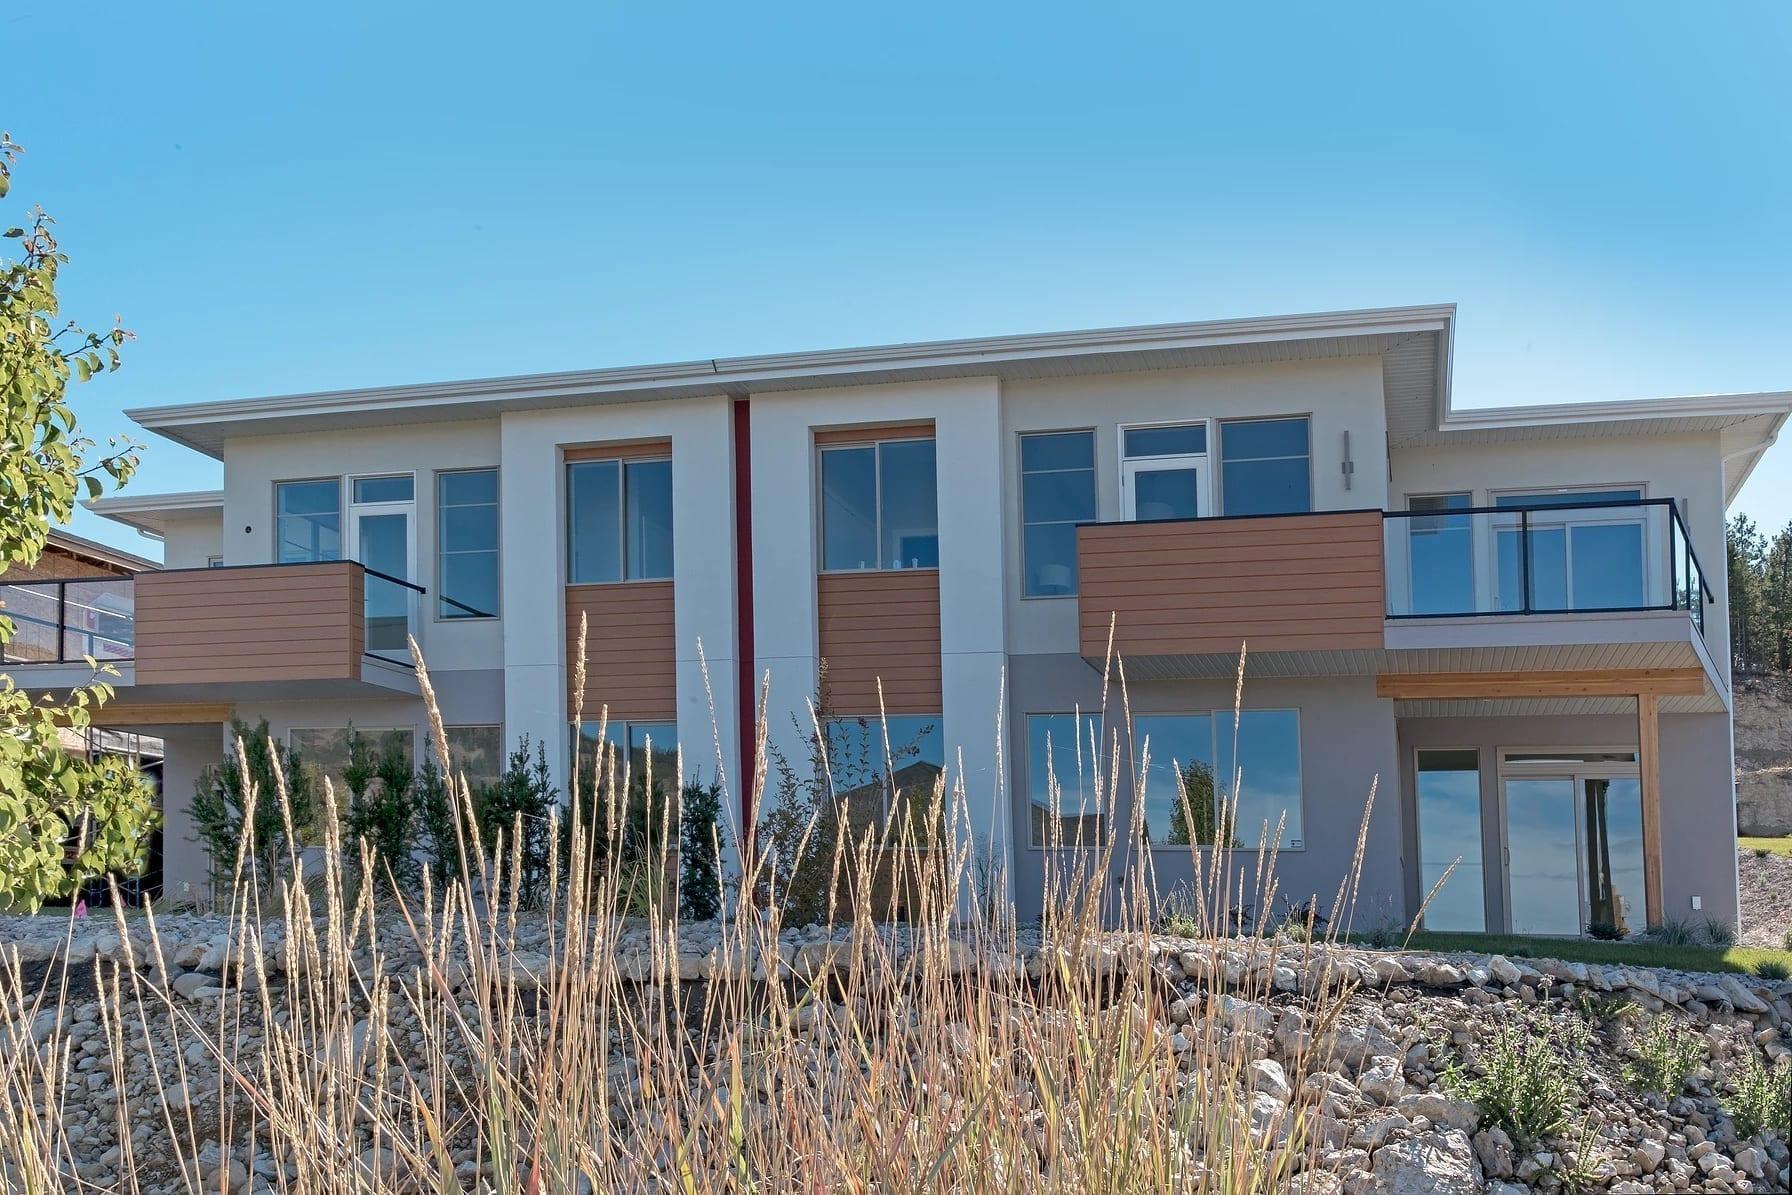 Dunbar Villas ontemporary exterior, built by Impact Builders